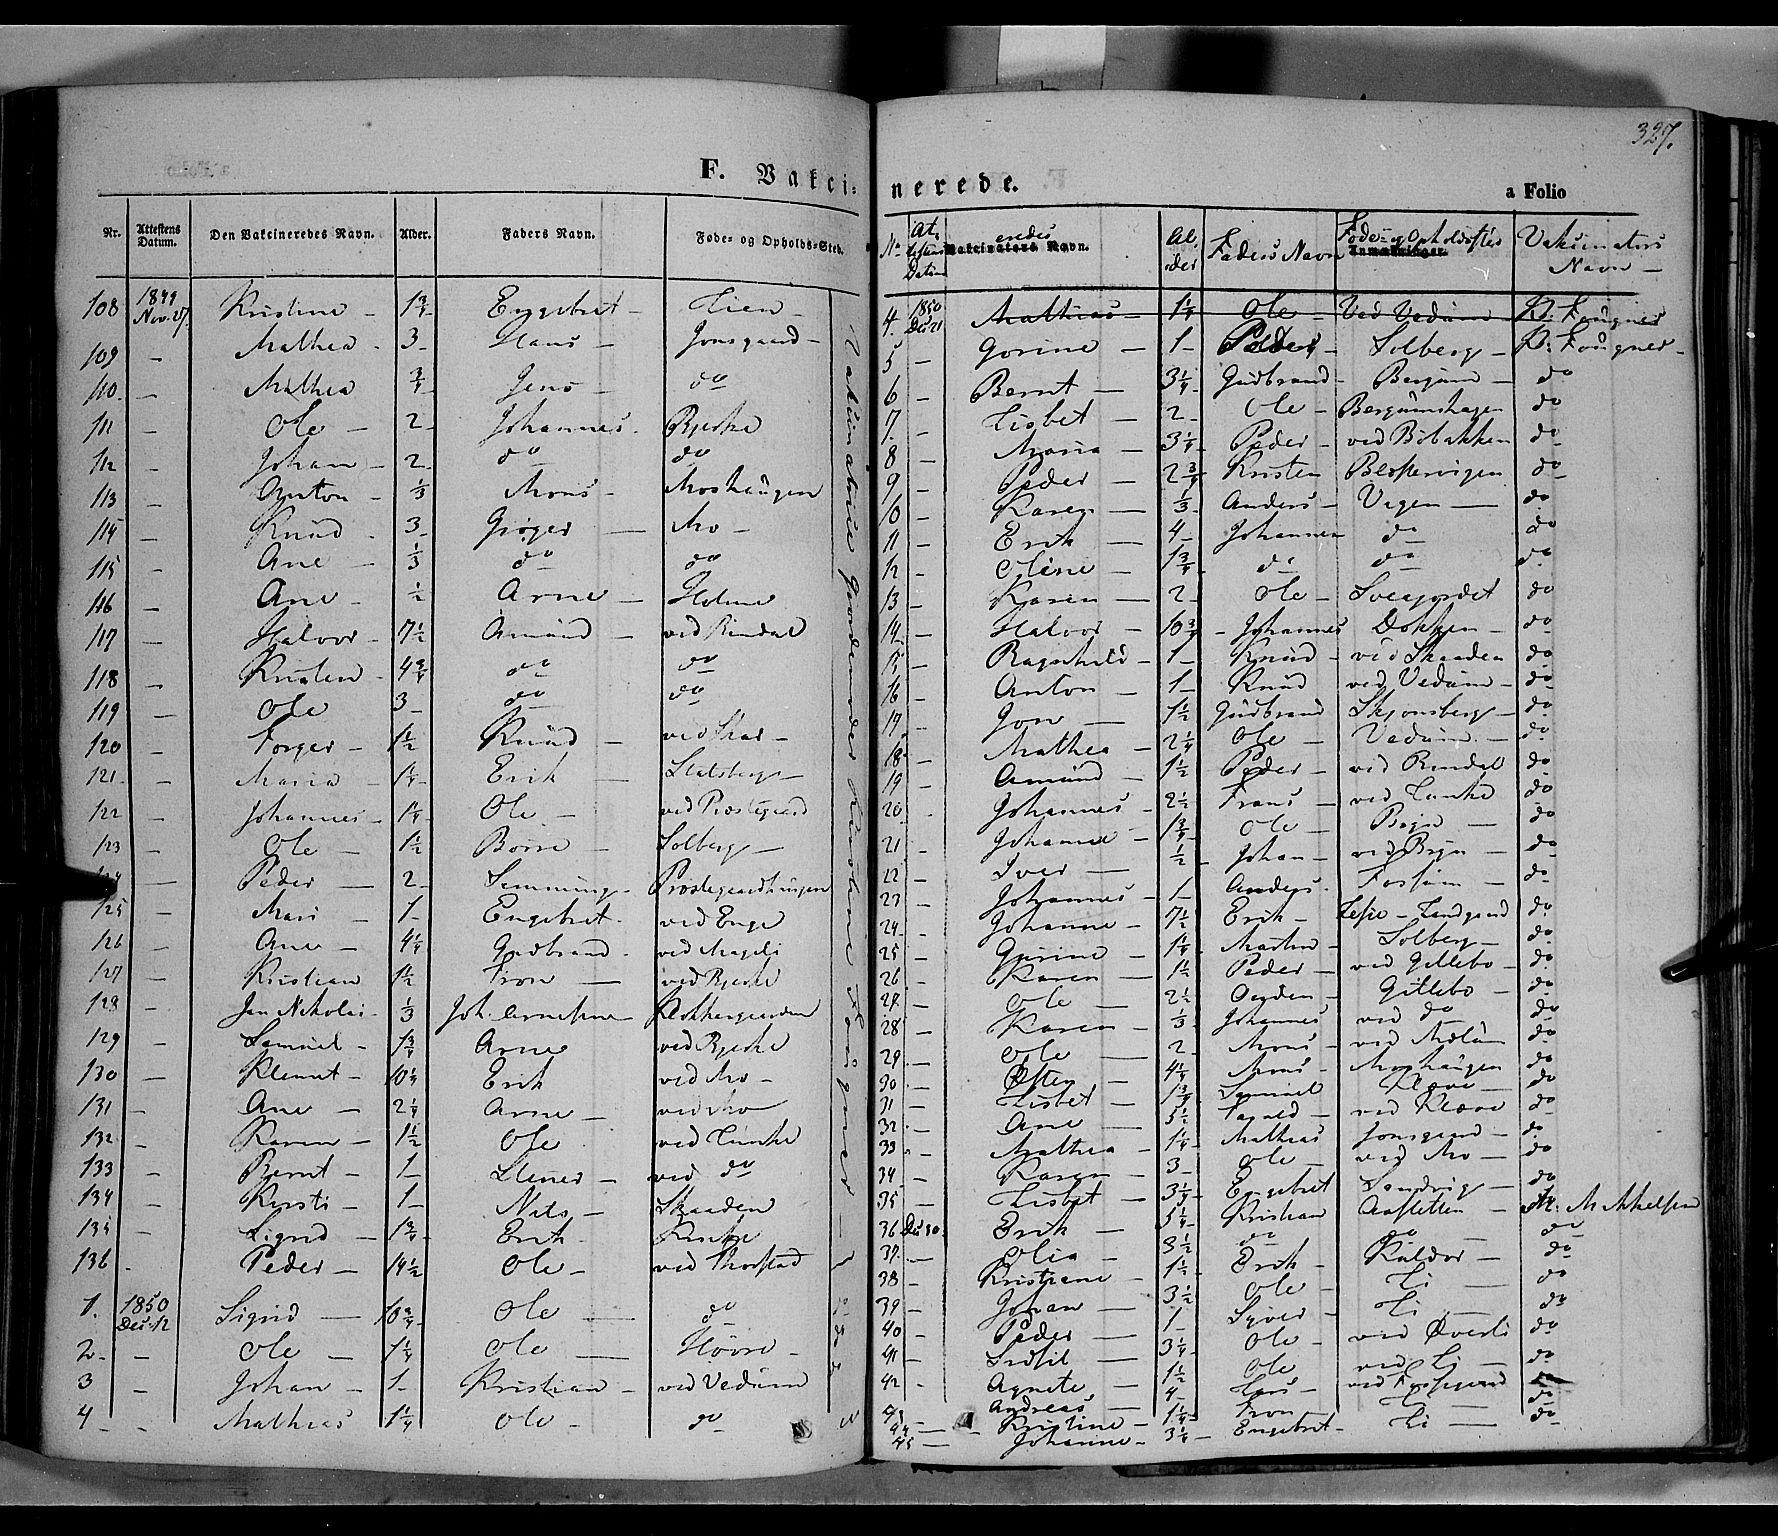 SAH, Øyer prestekontor, Ministerialbok nr. 5, 1842-1857, s. 327